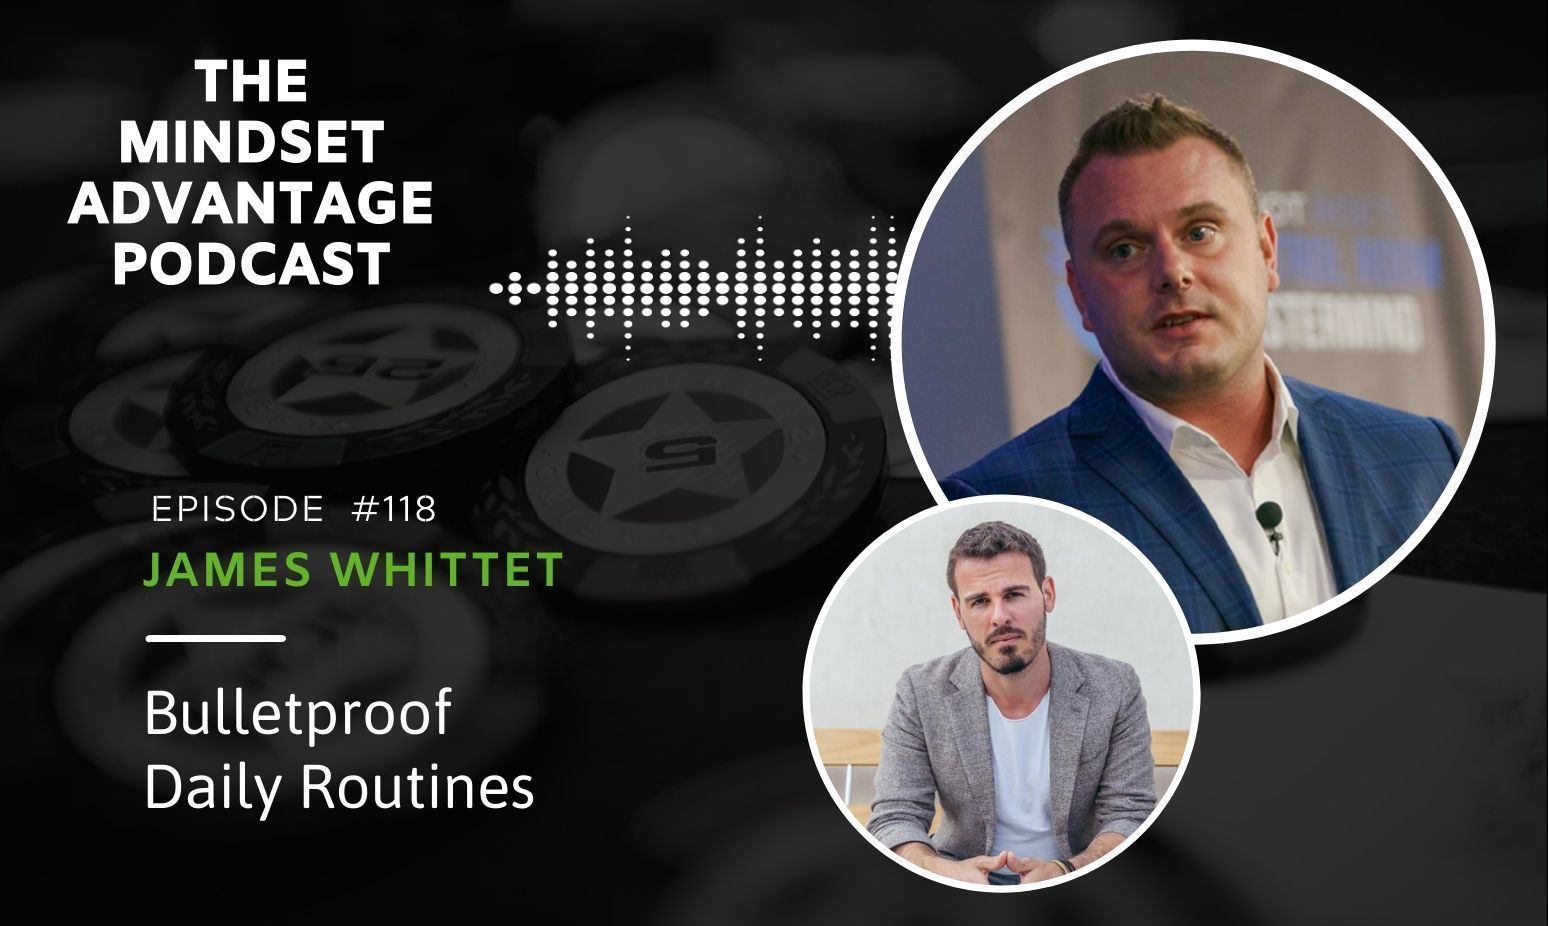 Episode 118 - James Whittet